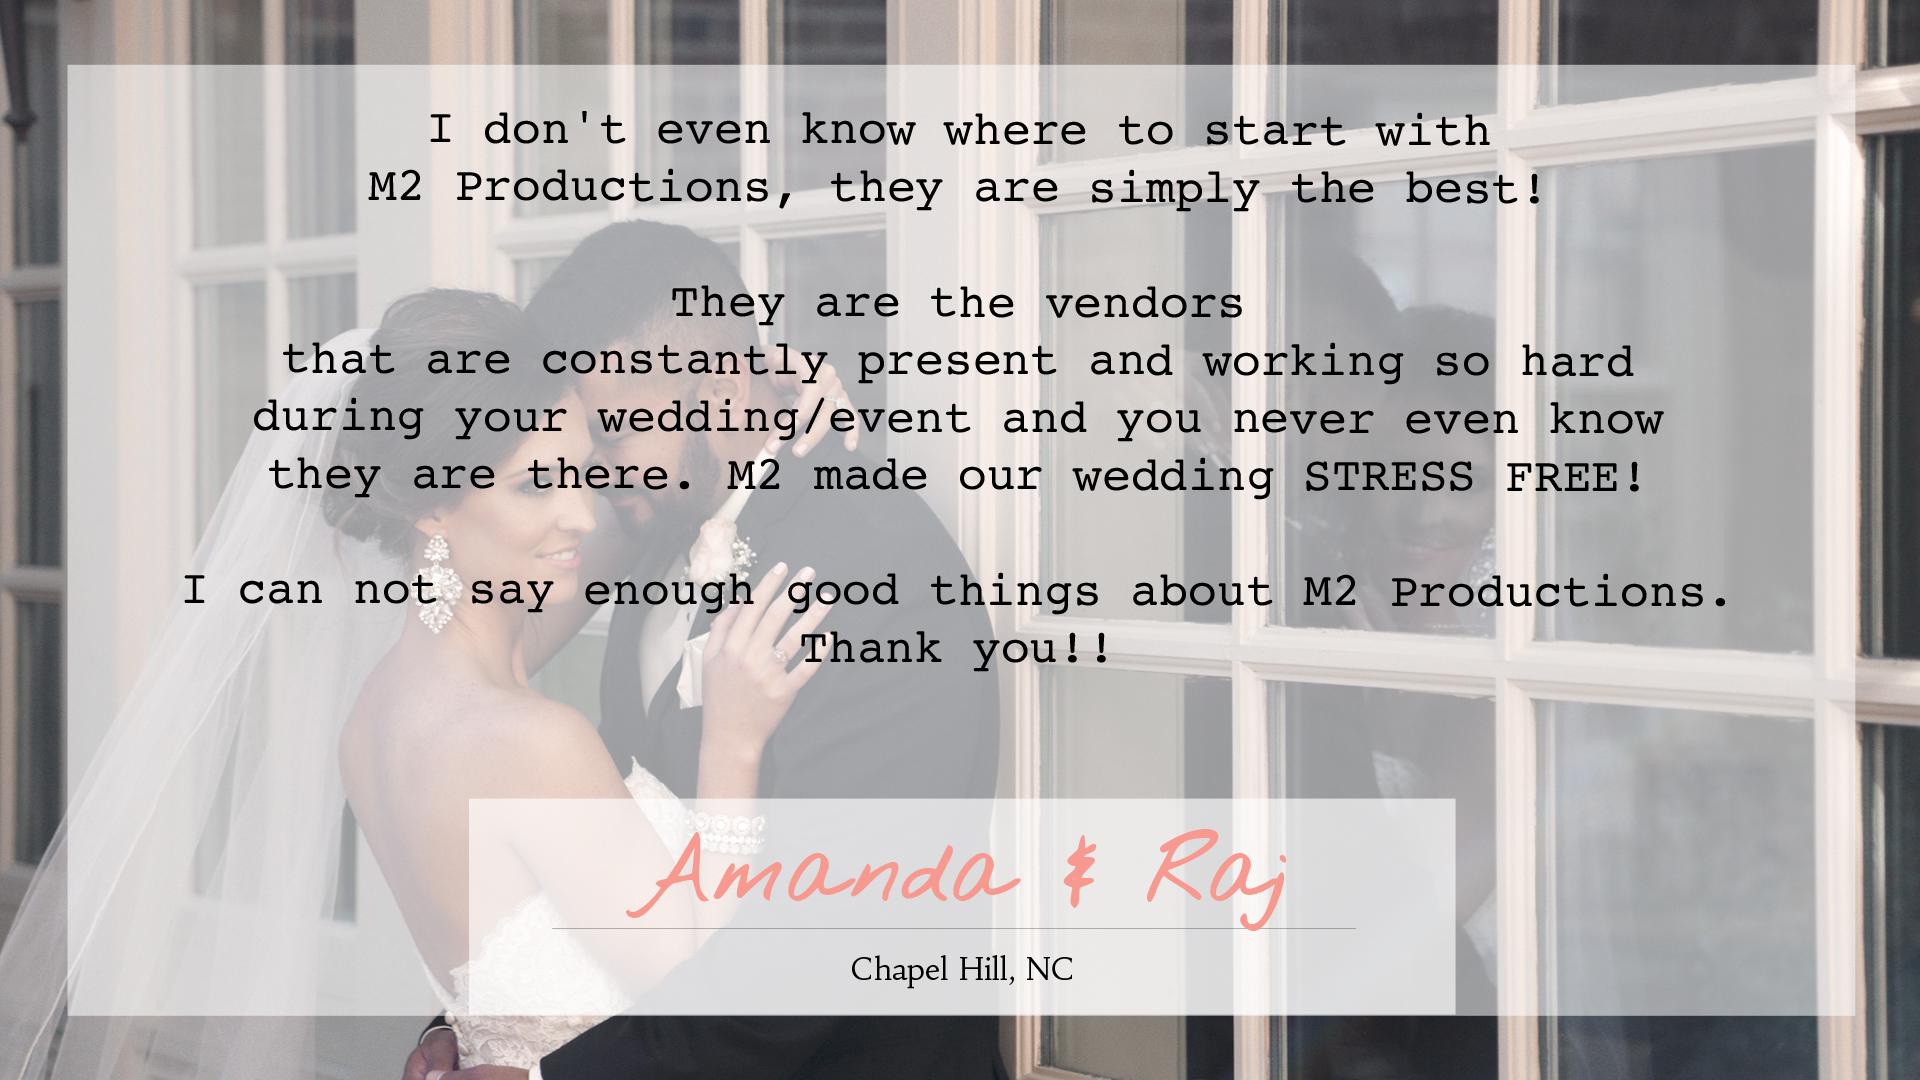 amanda and raj testimonial.jpg